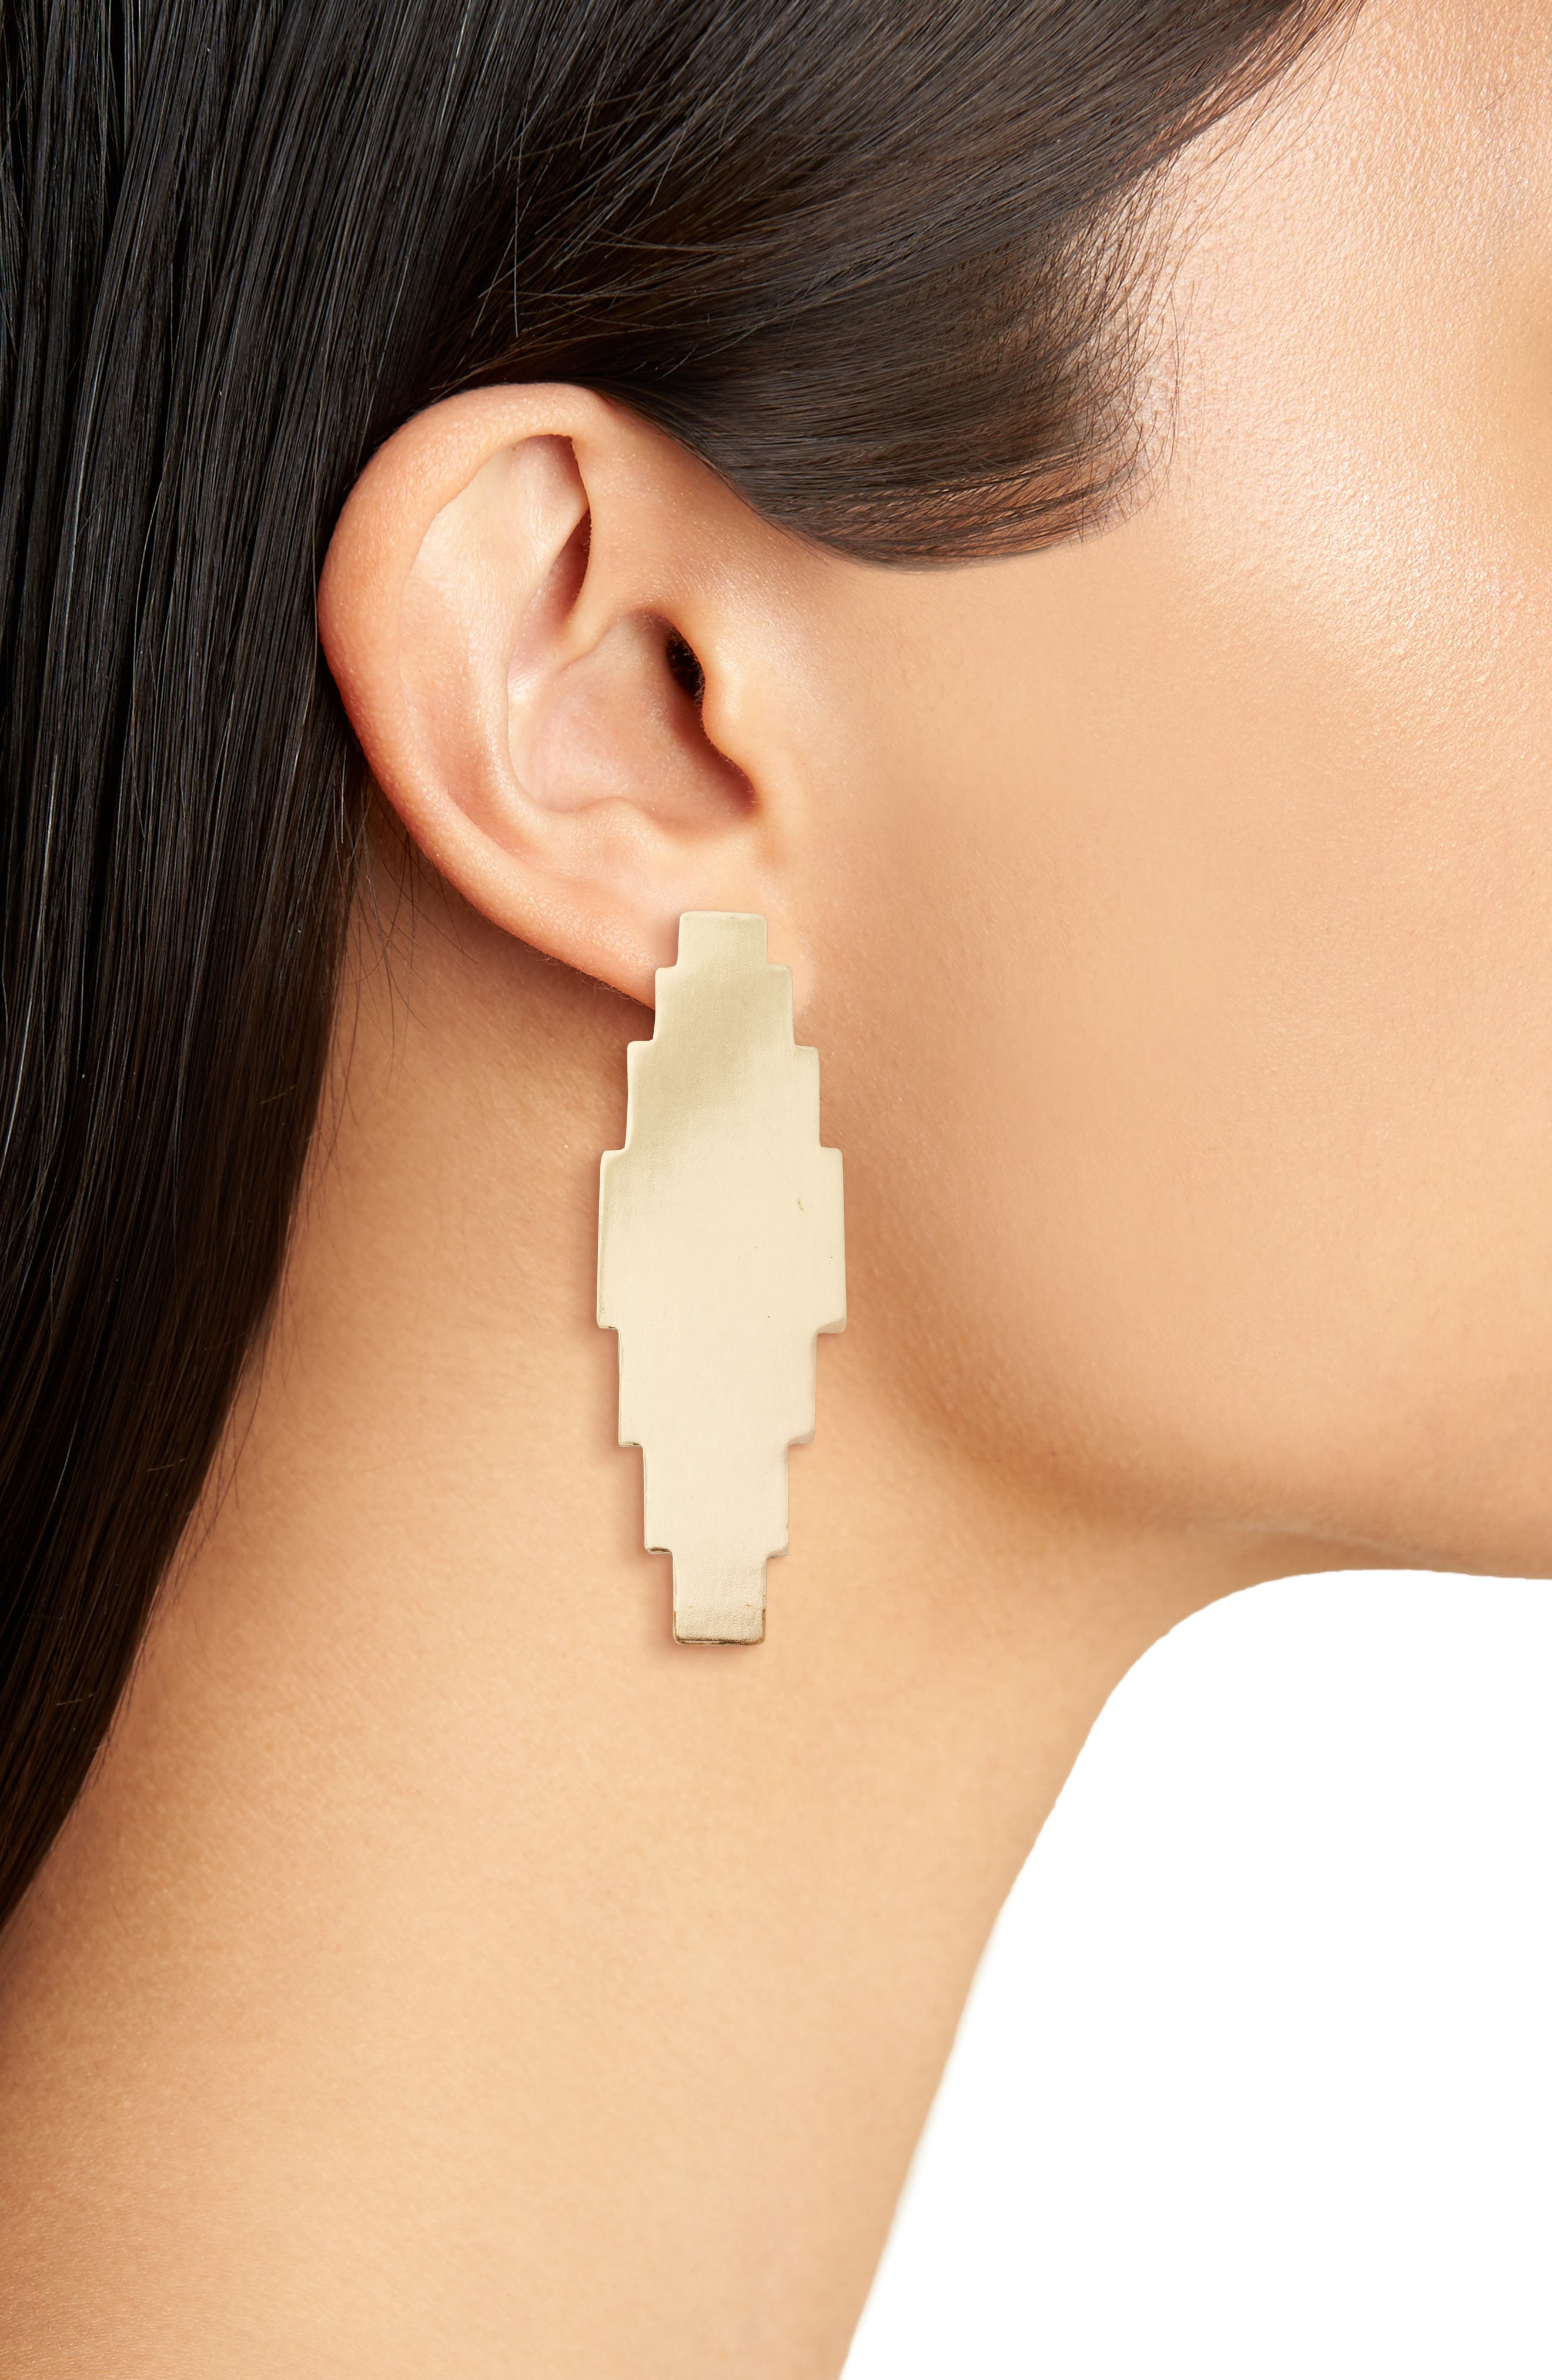 Elohi Post Earrings,                             Alternate thumbnail 2, color,                             Gold